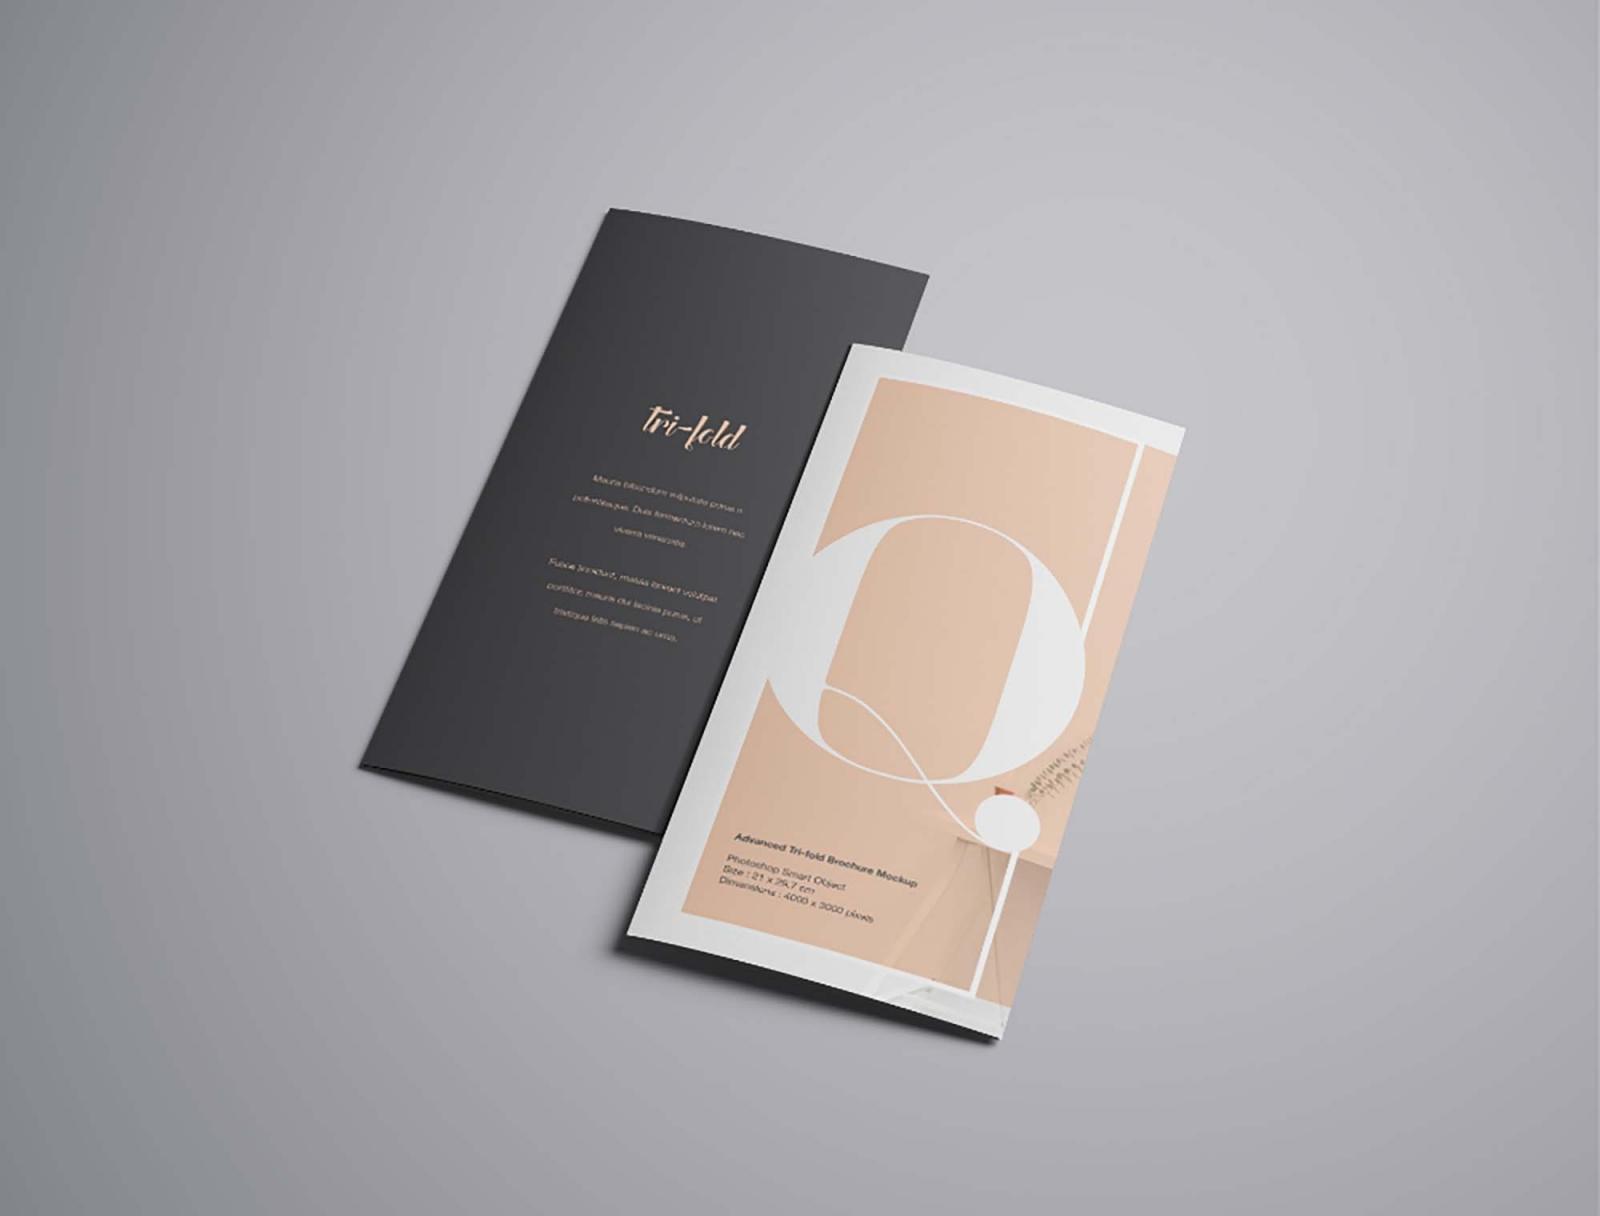 Tri fold Flyer Cover Mockup